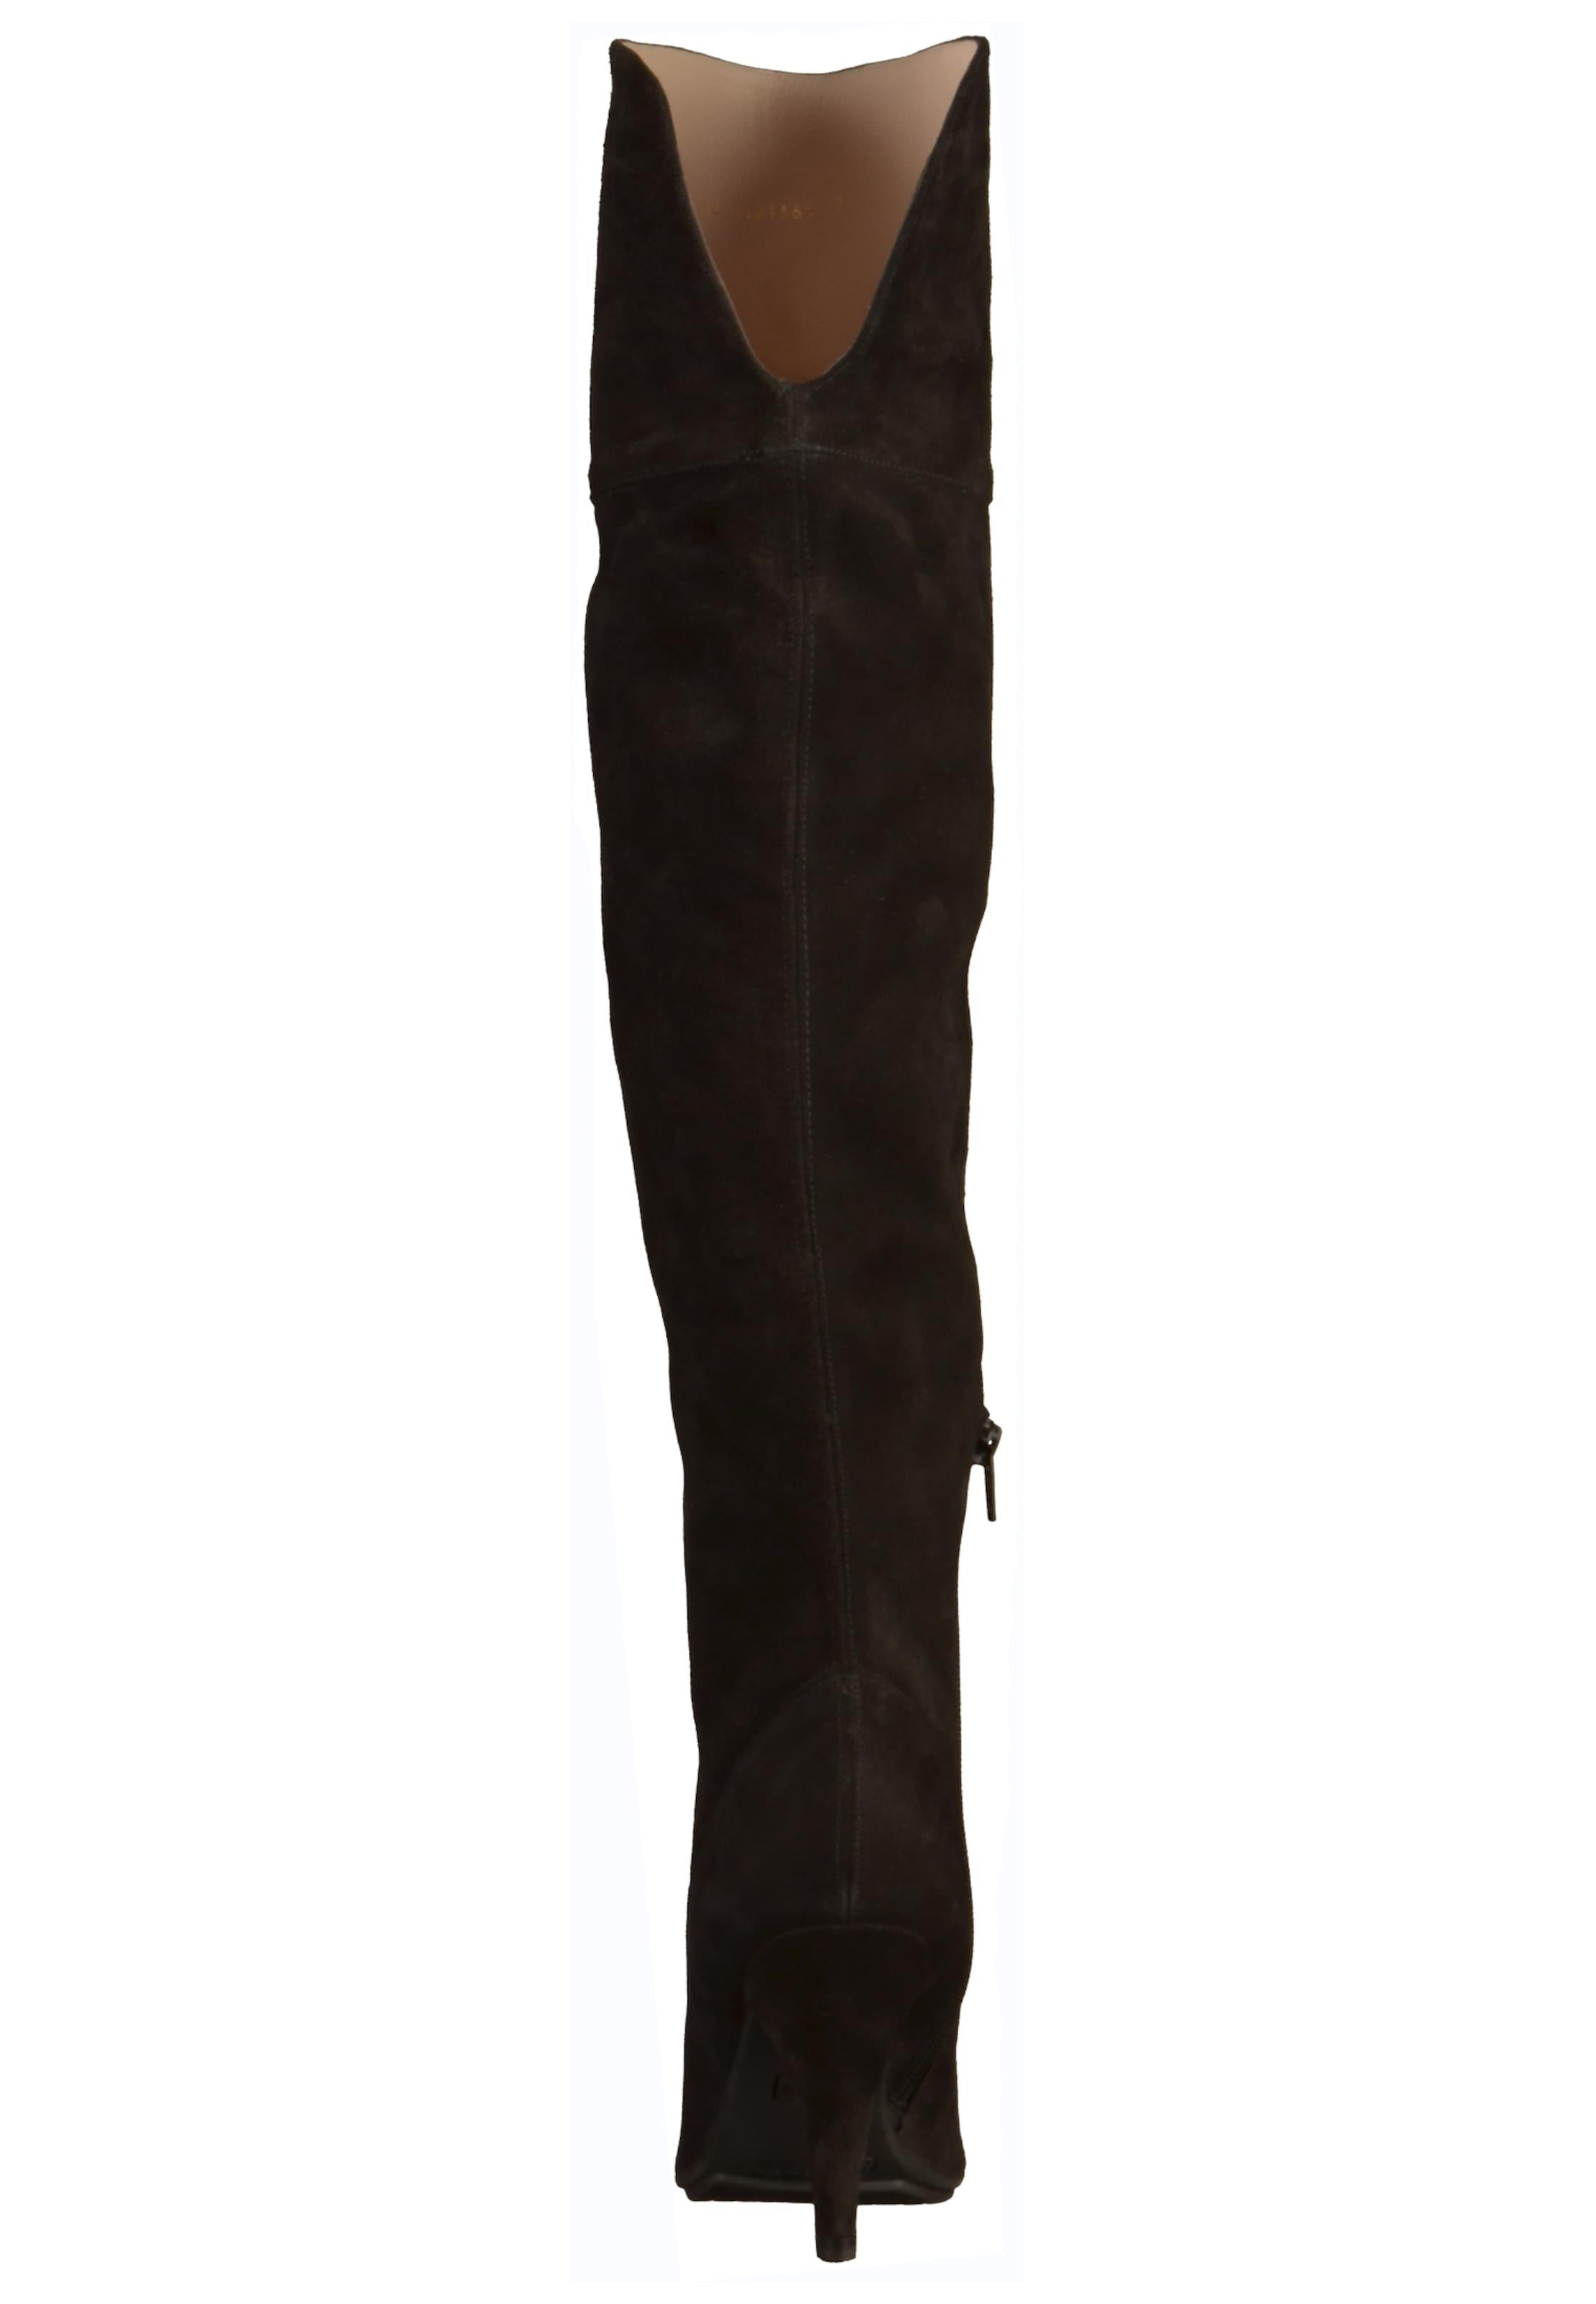 Lodi Lodi Lodi Stiefel Leder Bequem, gut aussehend 88e62c